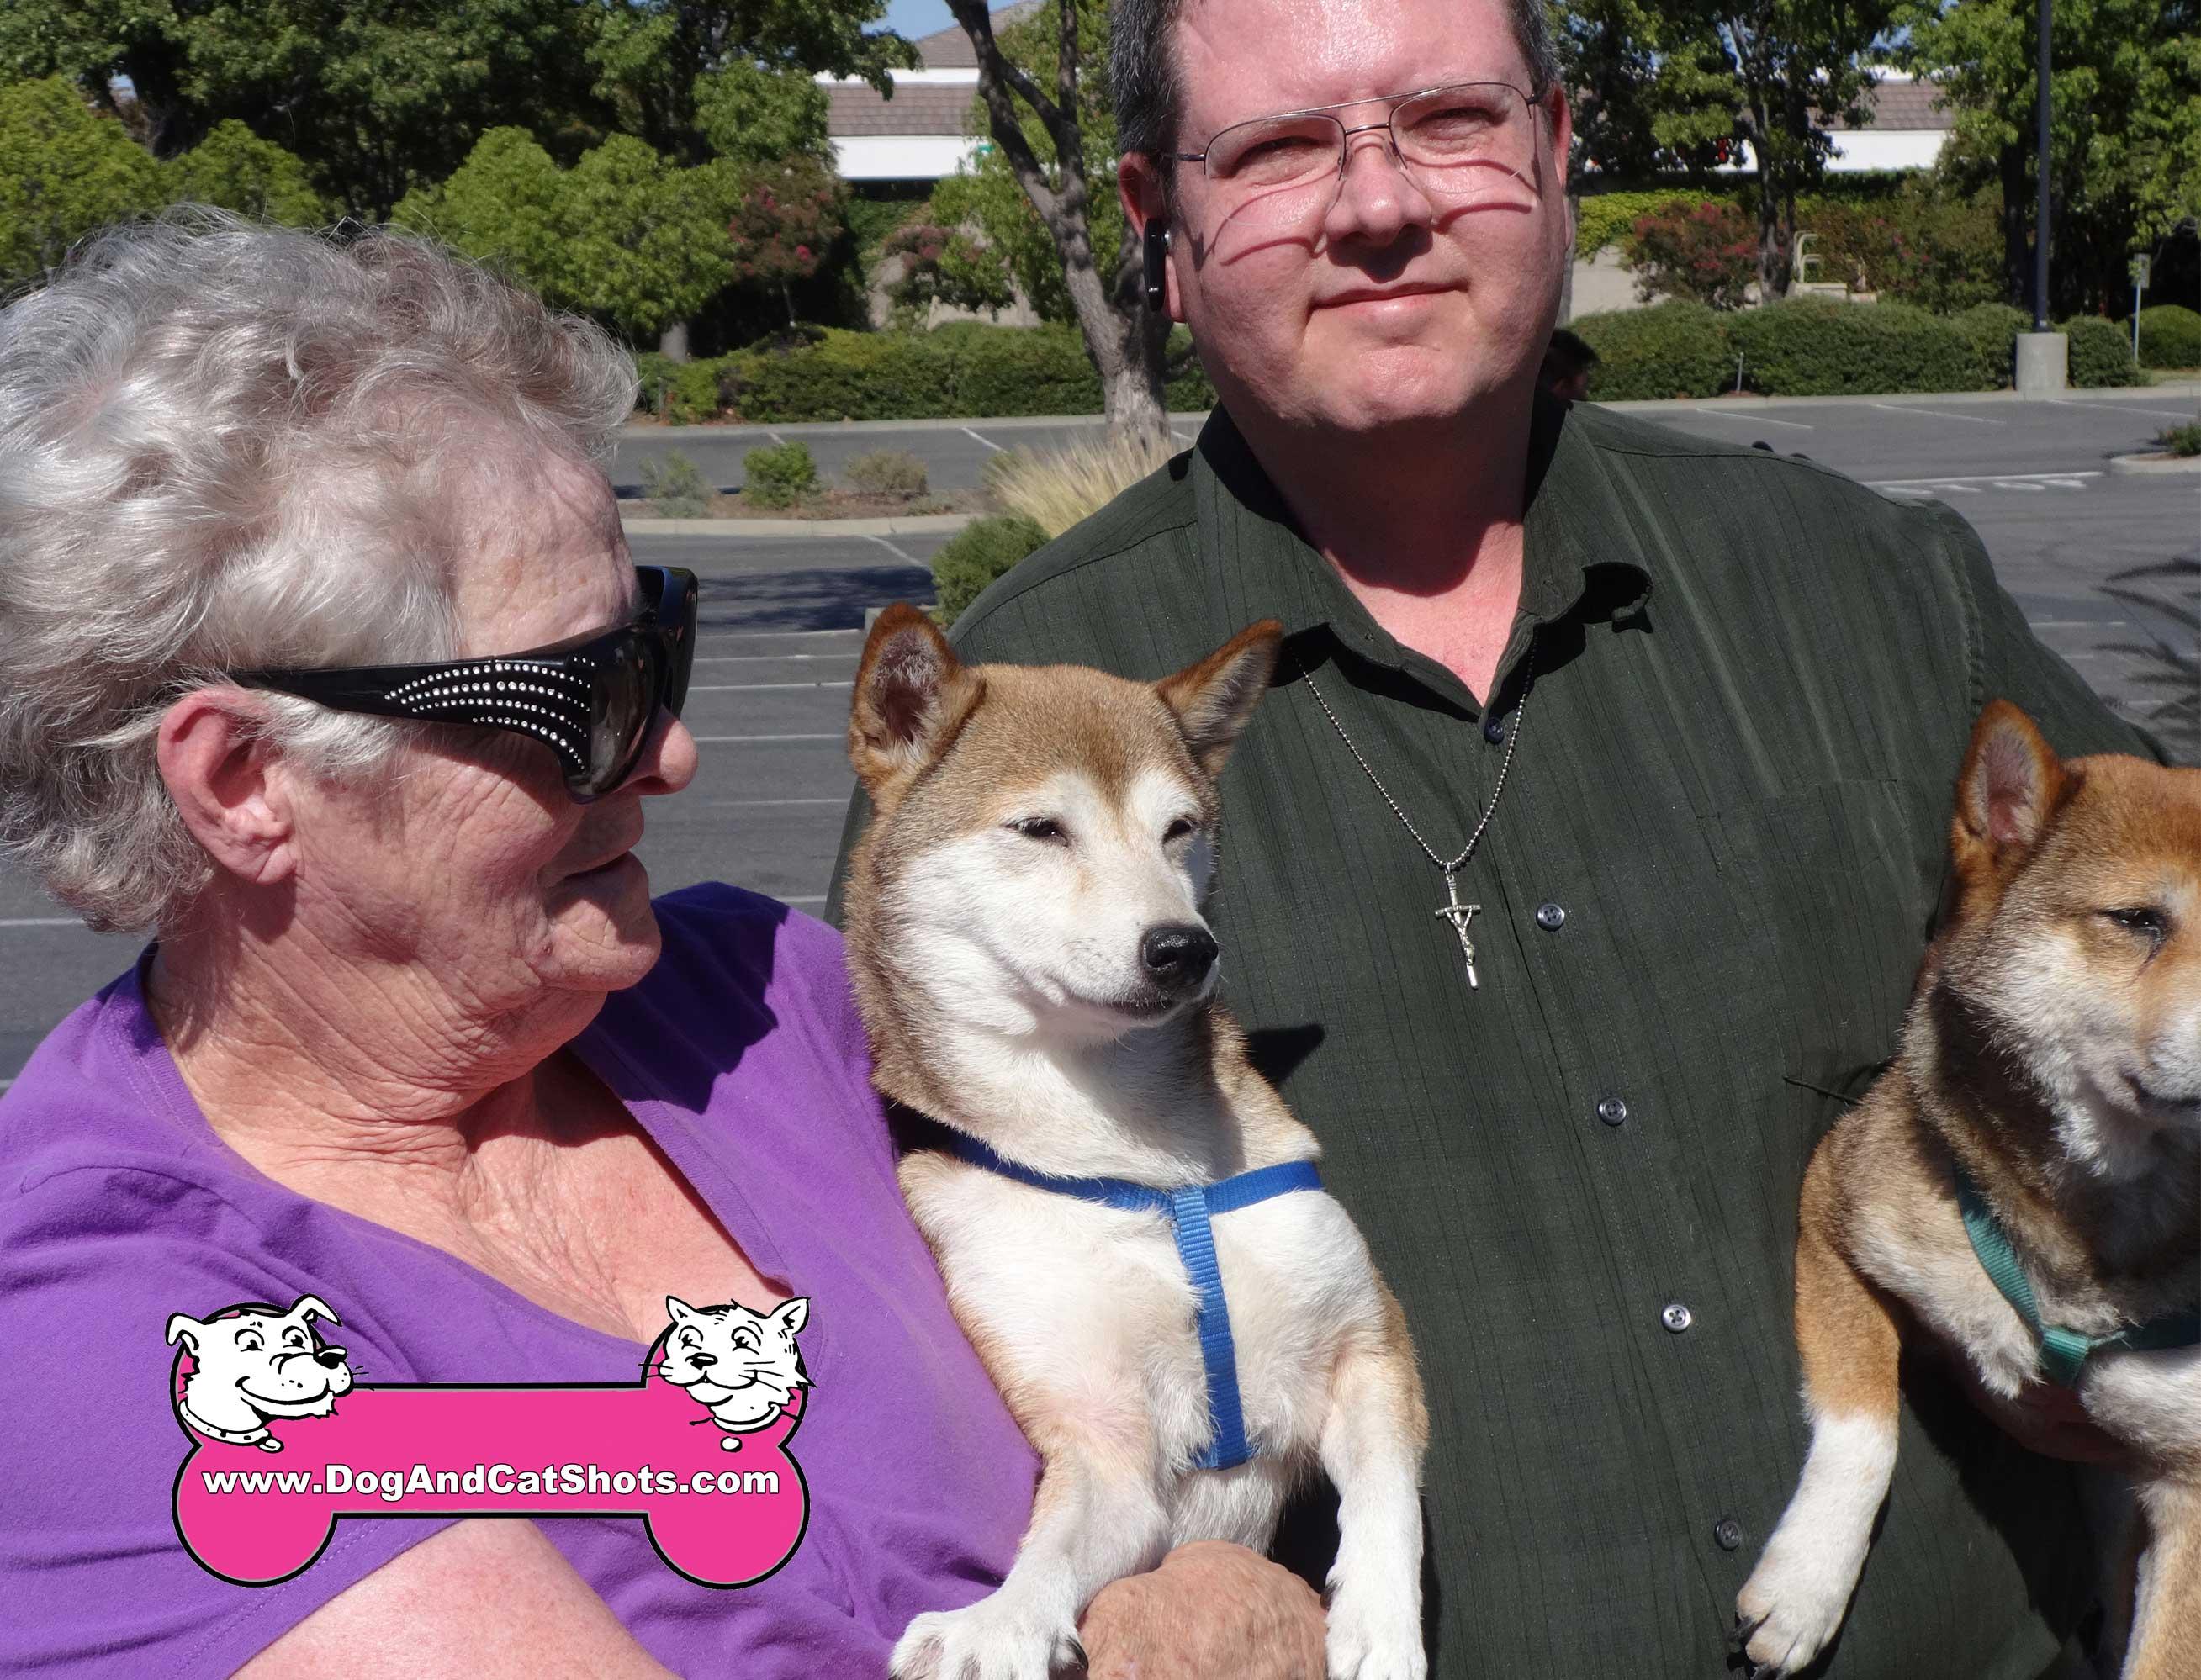 6-Vacaville,-Shiba-Inu,--dog-and-cat-shots